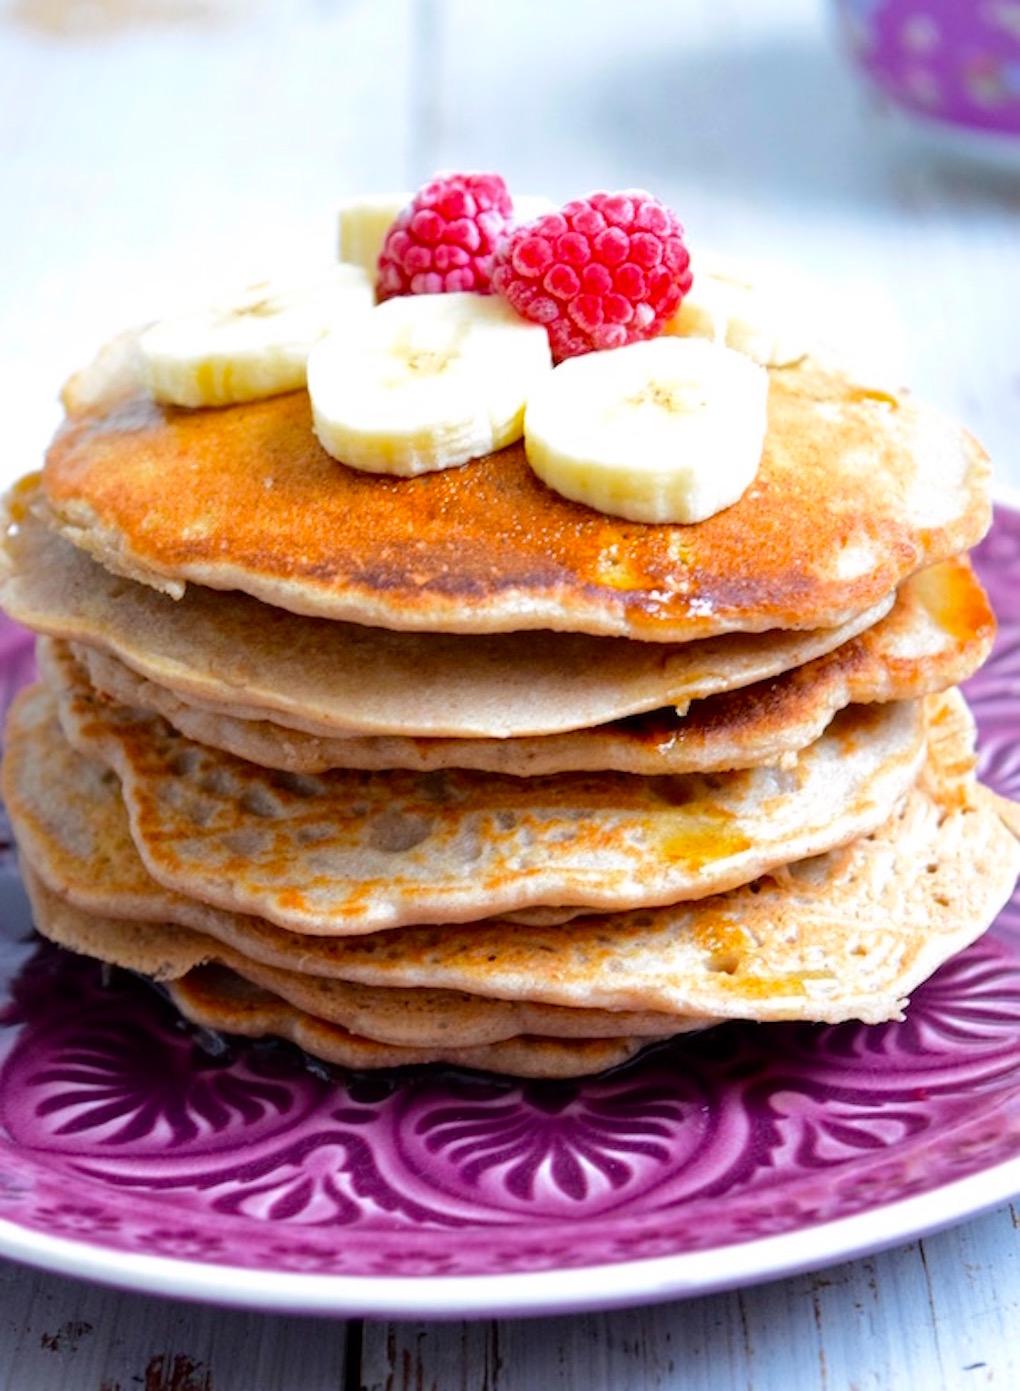 birnen-buchweizen-pancakes2dsc_0451